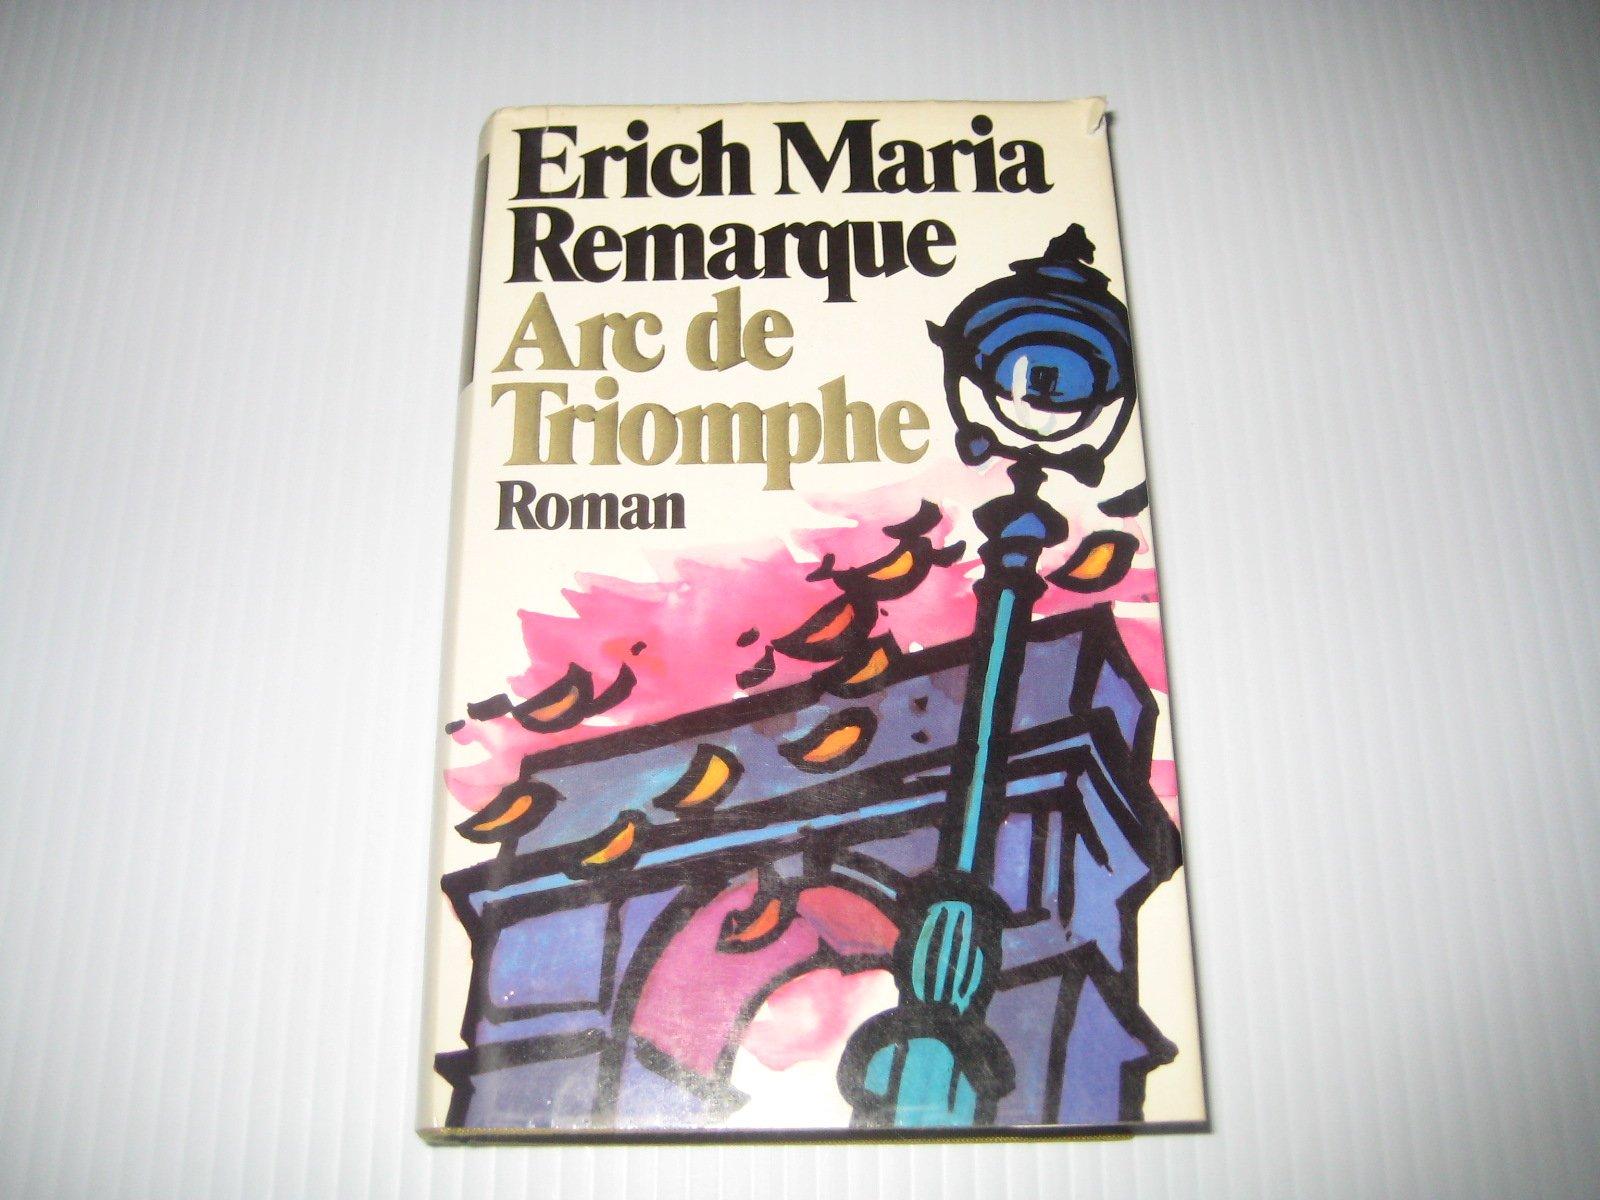 Erich Maria Remarque, Arc de Triomphe: a summary 20